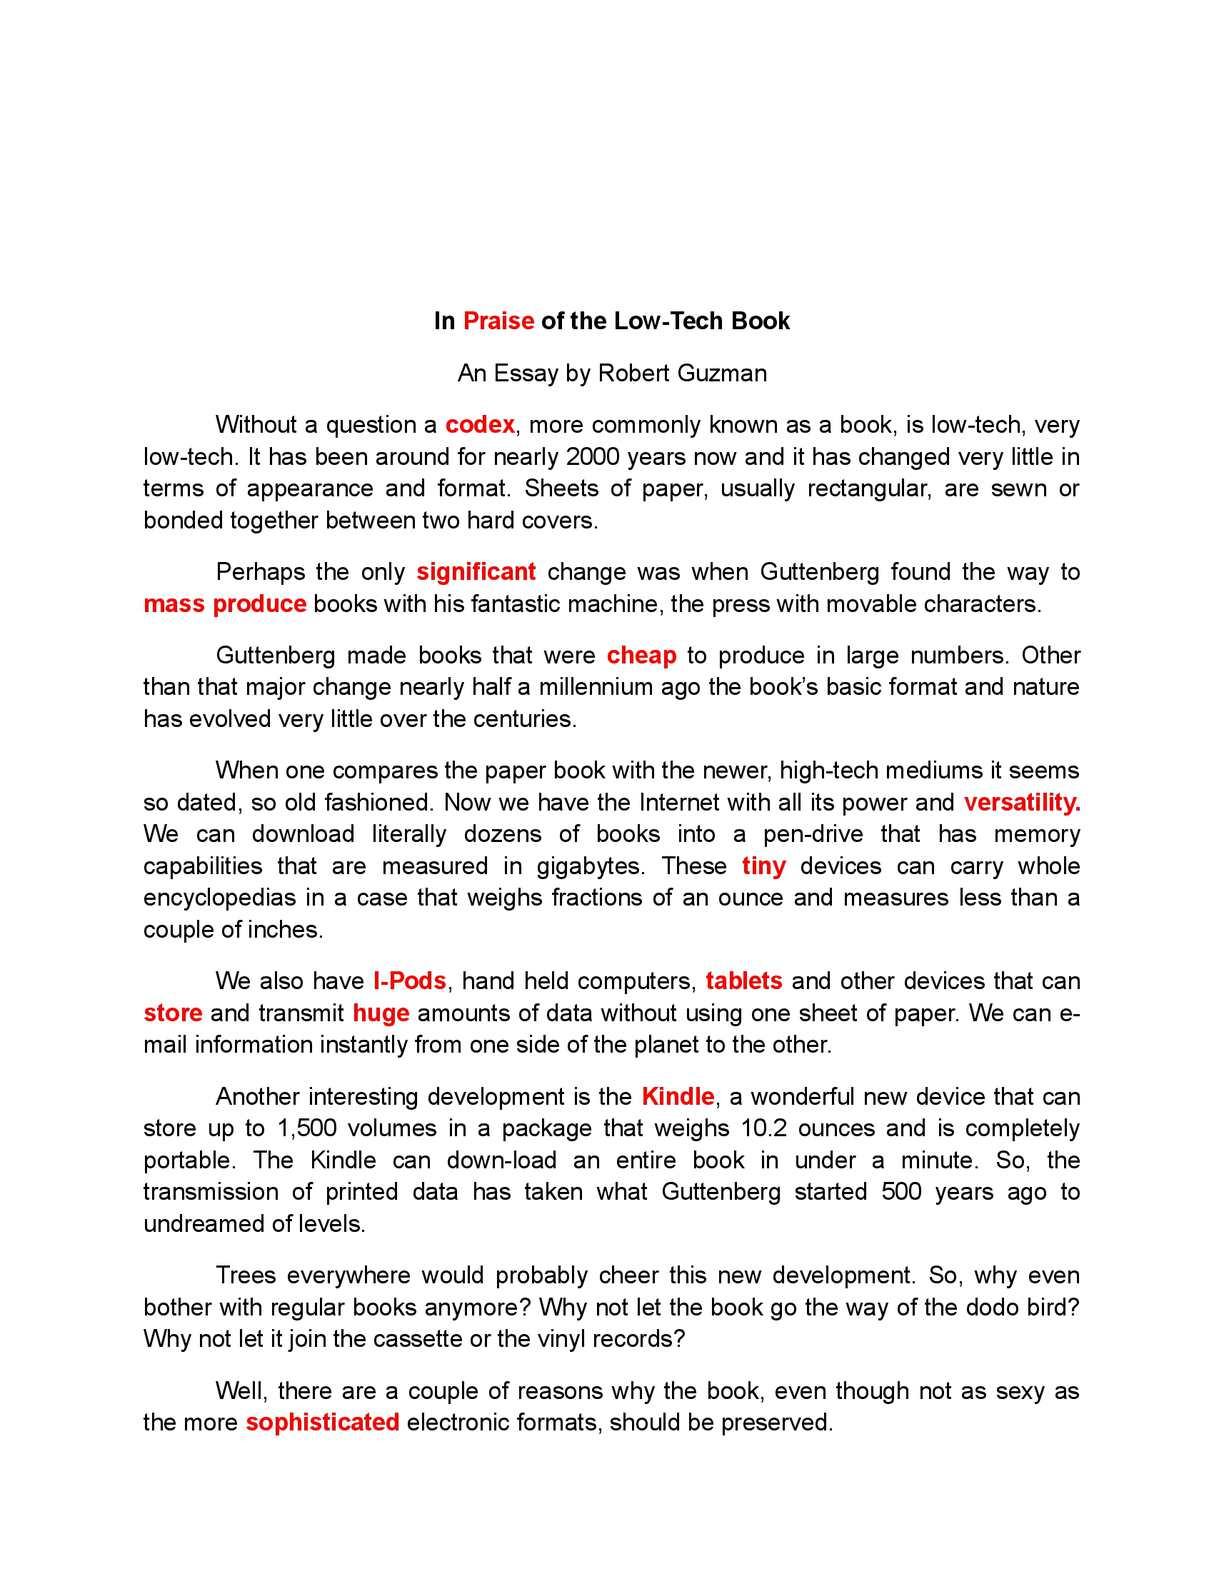 Calaméo - English 3201 Second Batch of Essays 2014